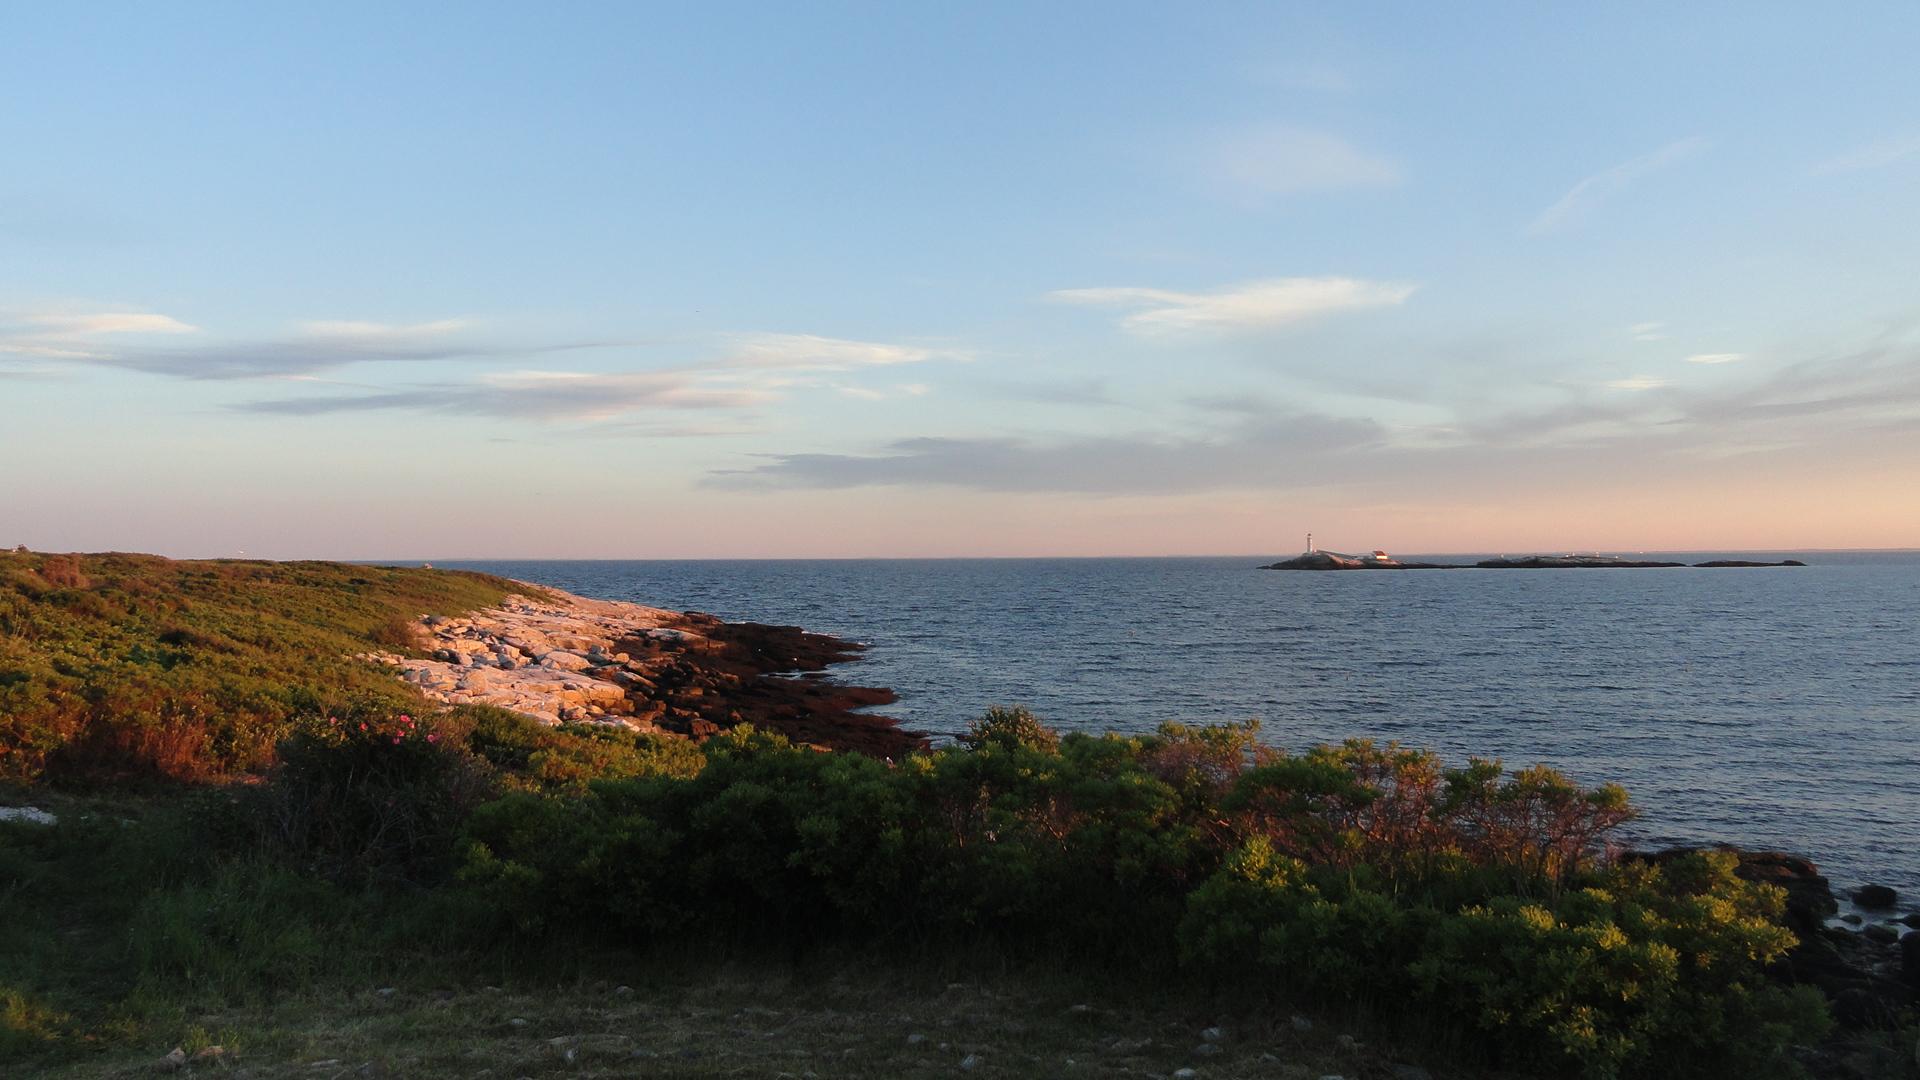 Lighthouse & Coastline